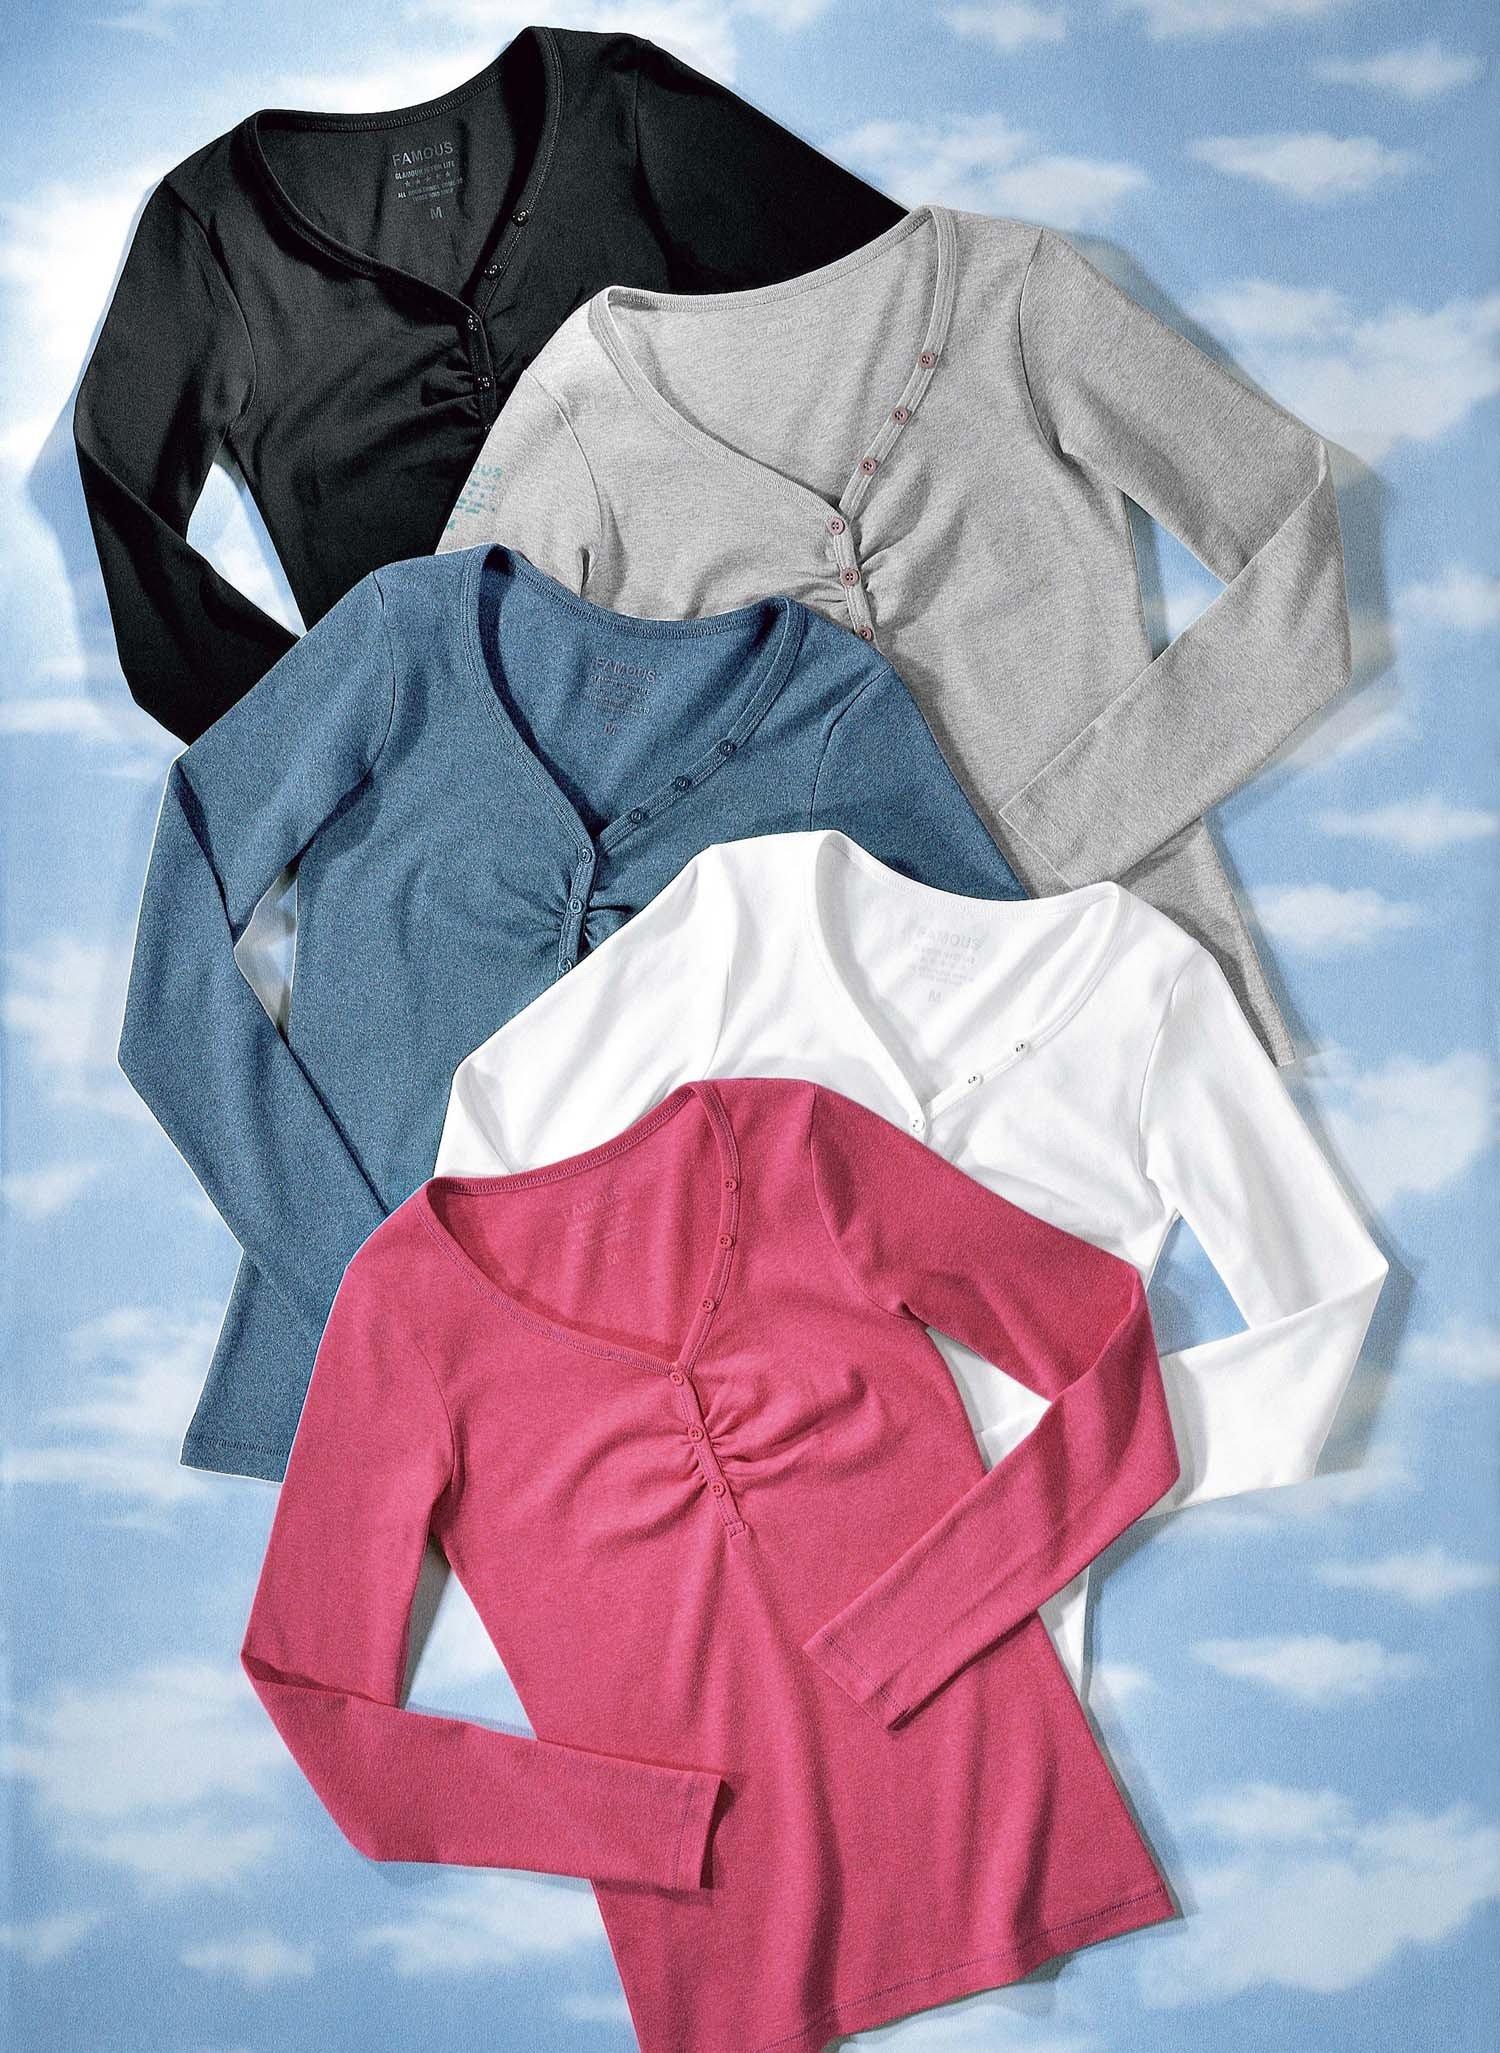 D-LA-Shirt,V-Auss.grau mel. L 004 - 2 - Ronja.ch